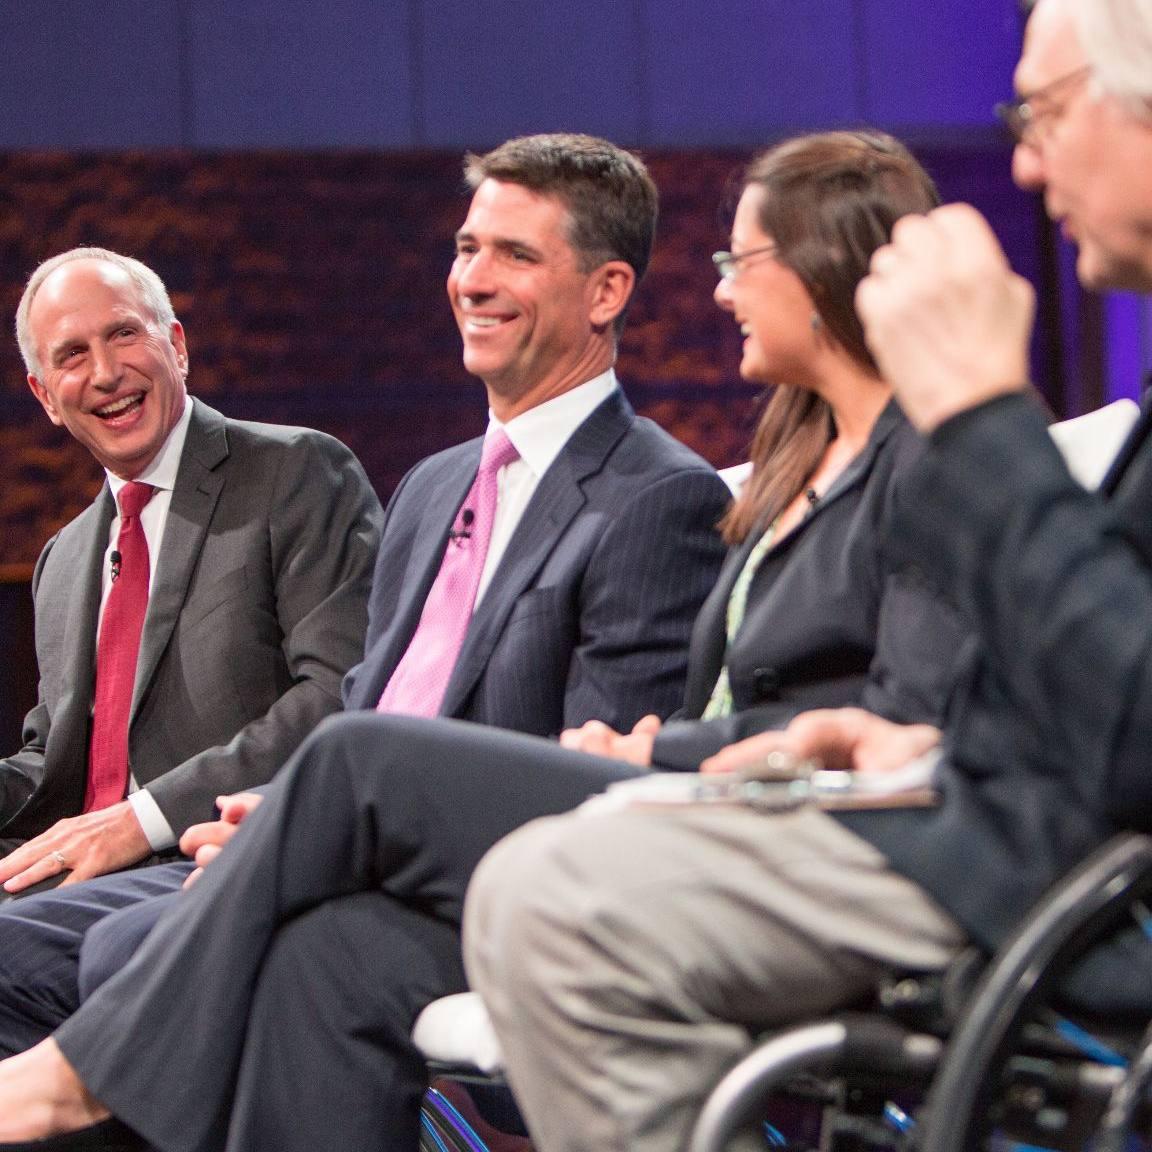 speaking panel at Transform 2016 session